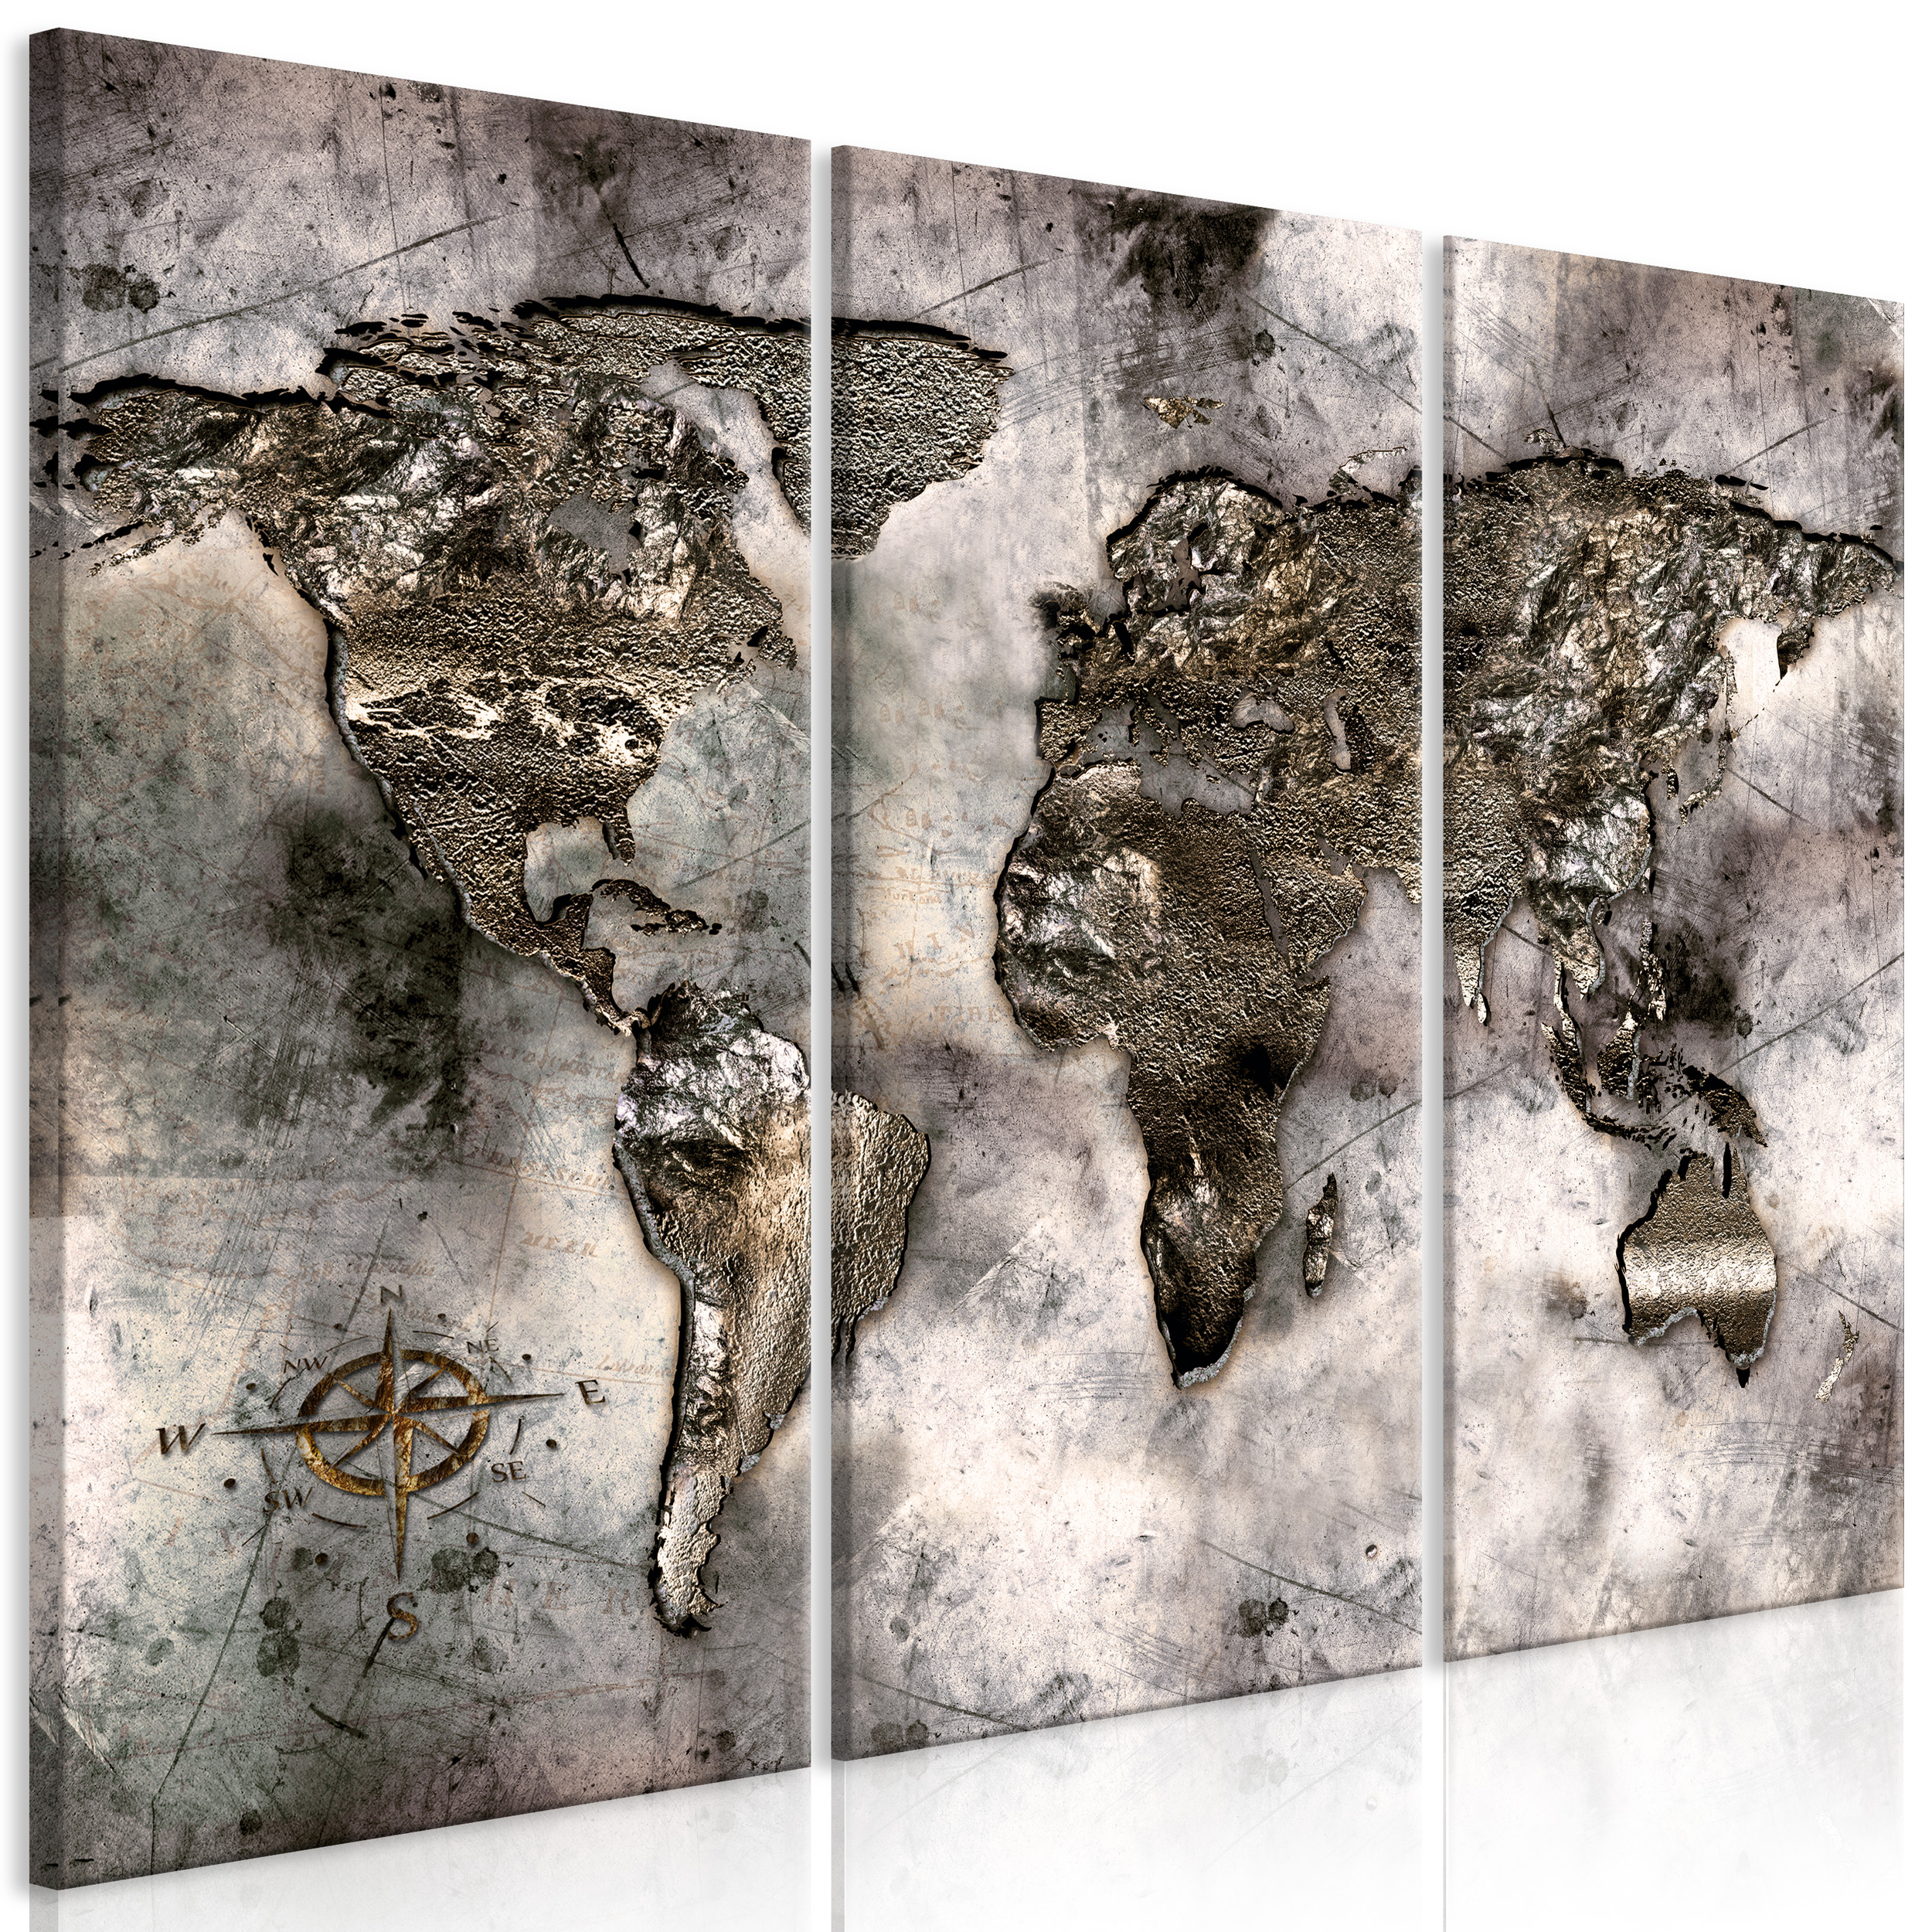 Details zu Weltkarte PINNWAND Kork LEINWANDBILDER Bilder Wandbilder XXL  Wohnzimmer Groß 3tl